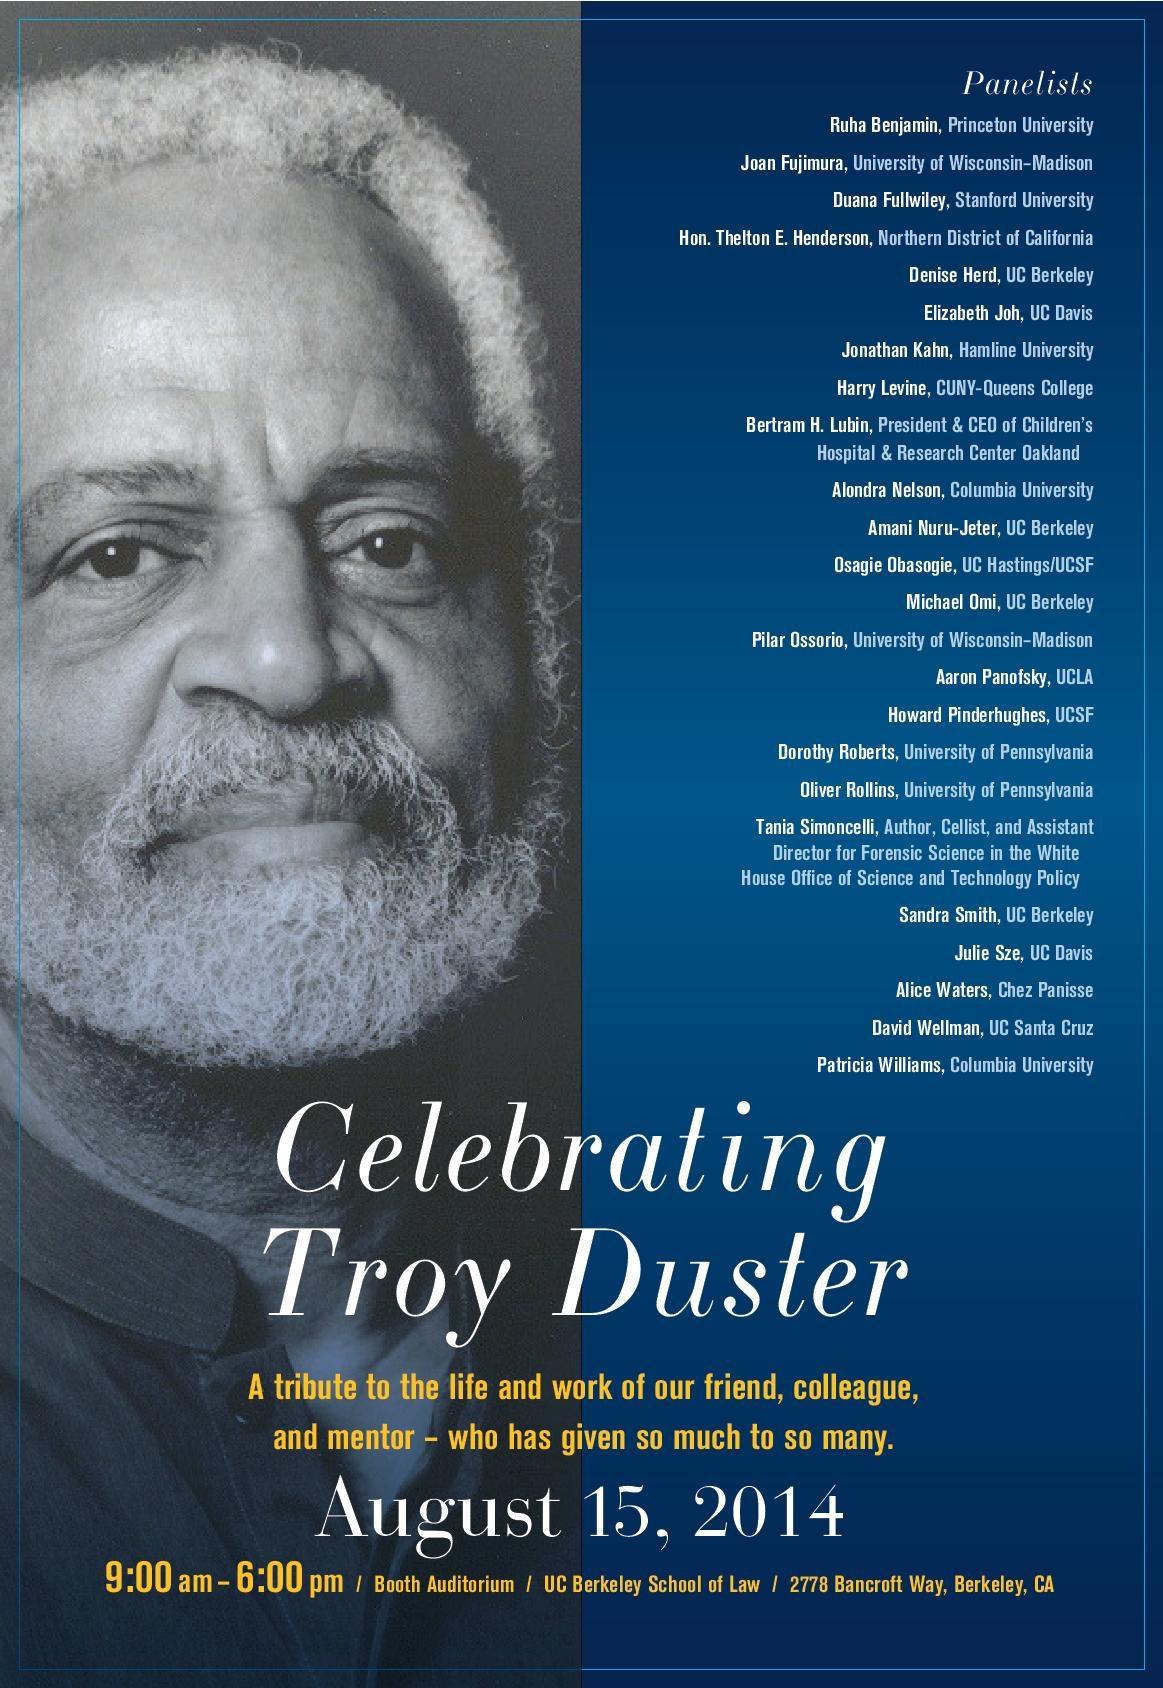 Celebrating Troy Duster